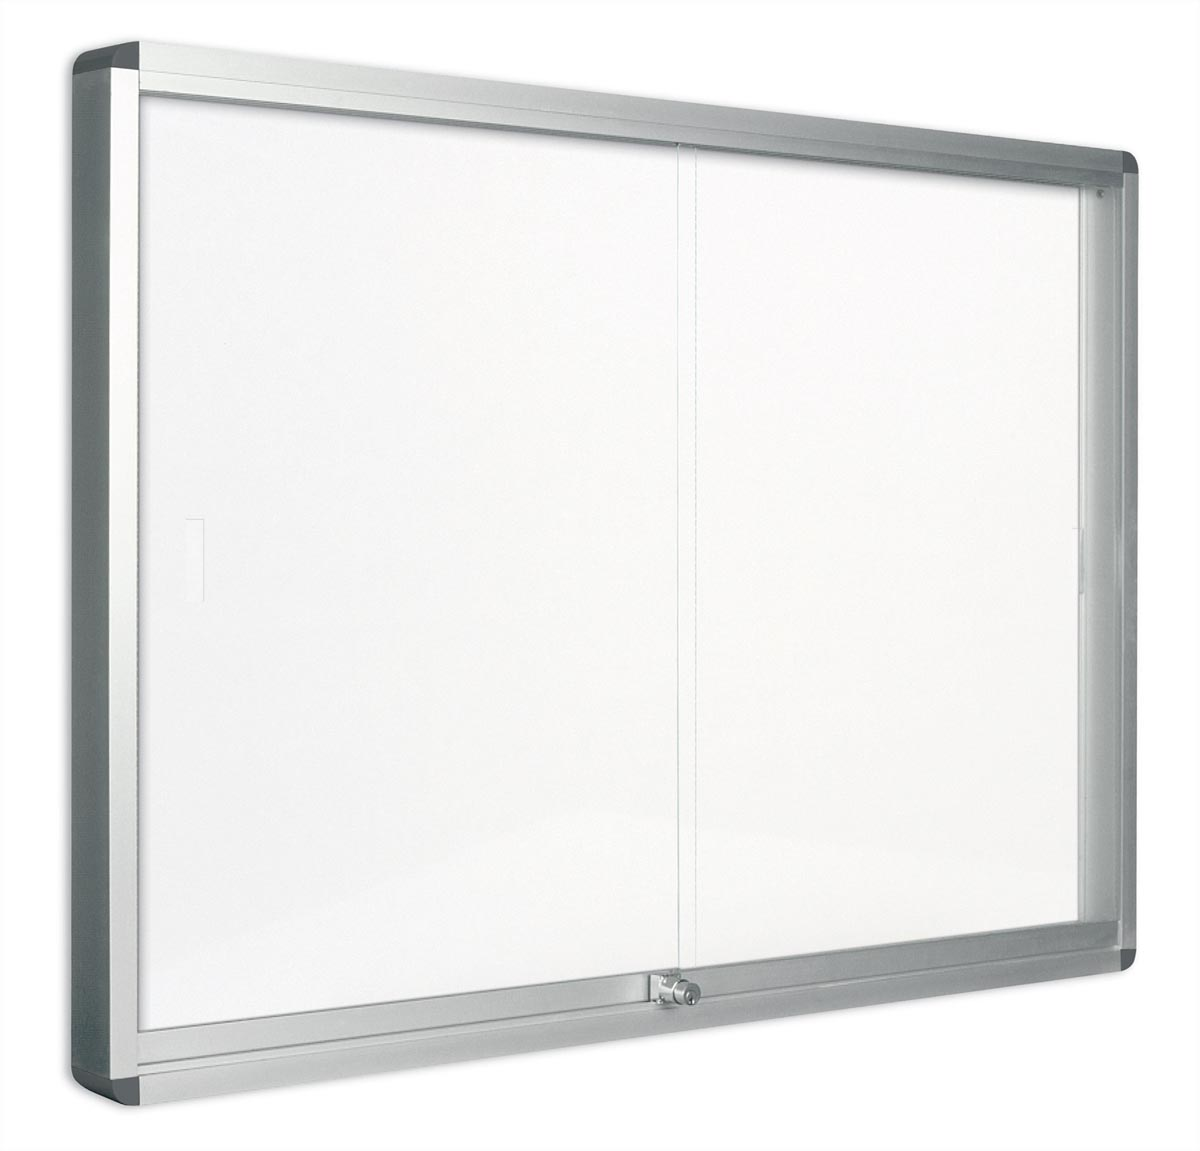 Pergamy glazen vitrine met schuifdeur en magnetische achtergrond ft 18 x A4